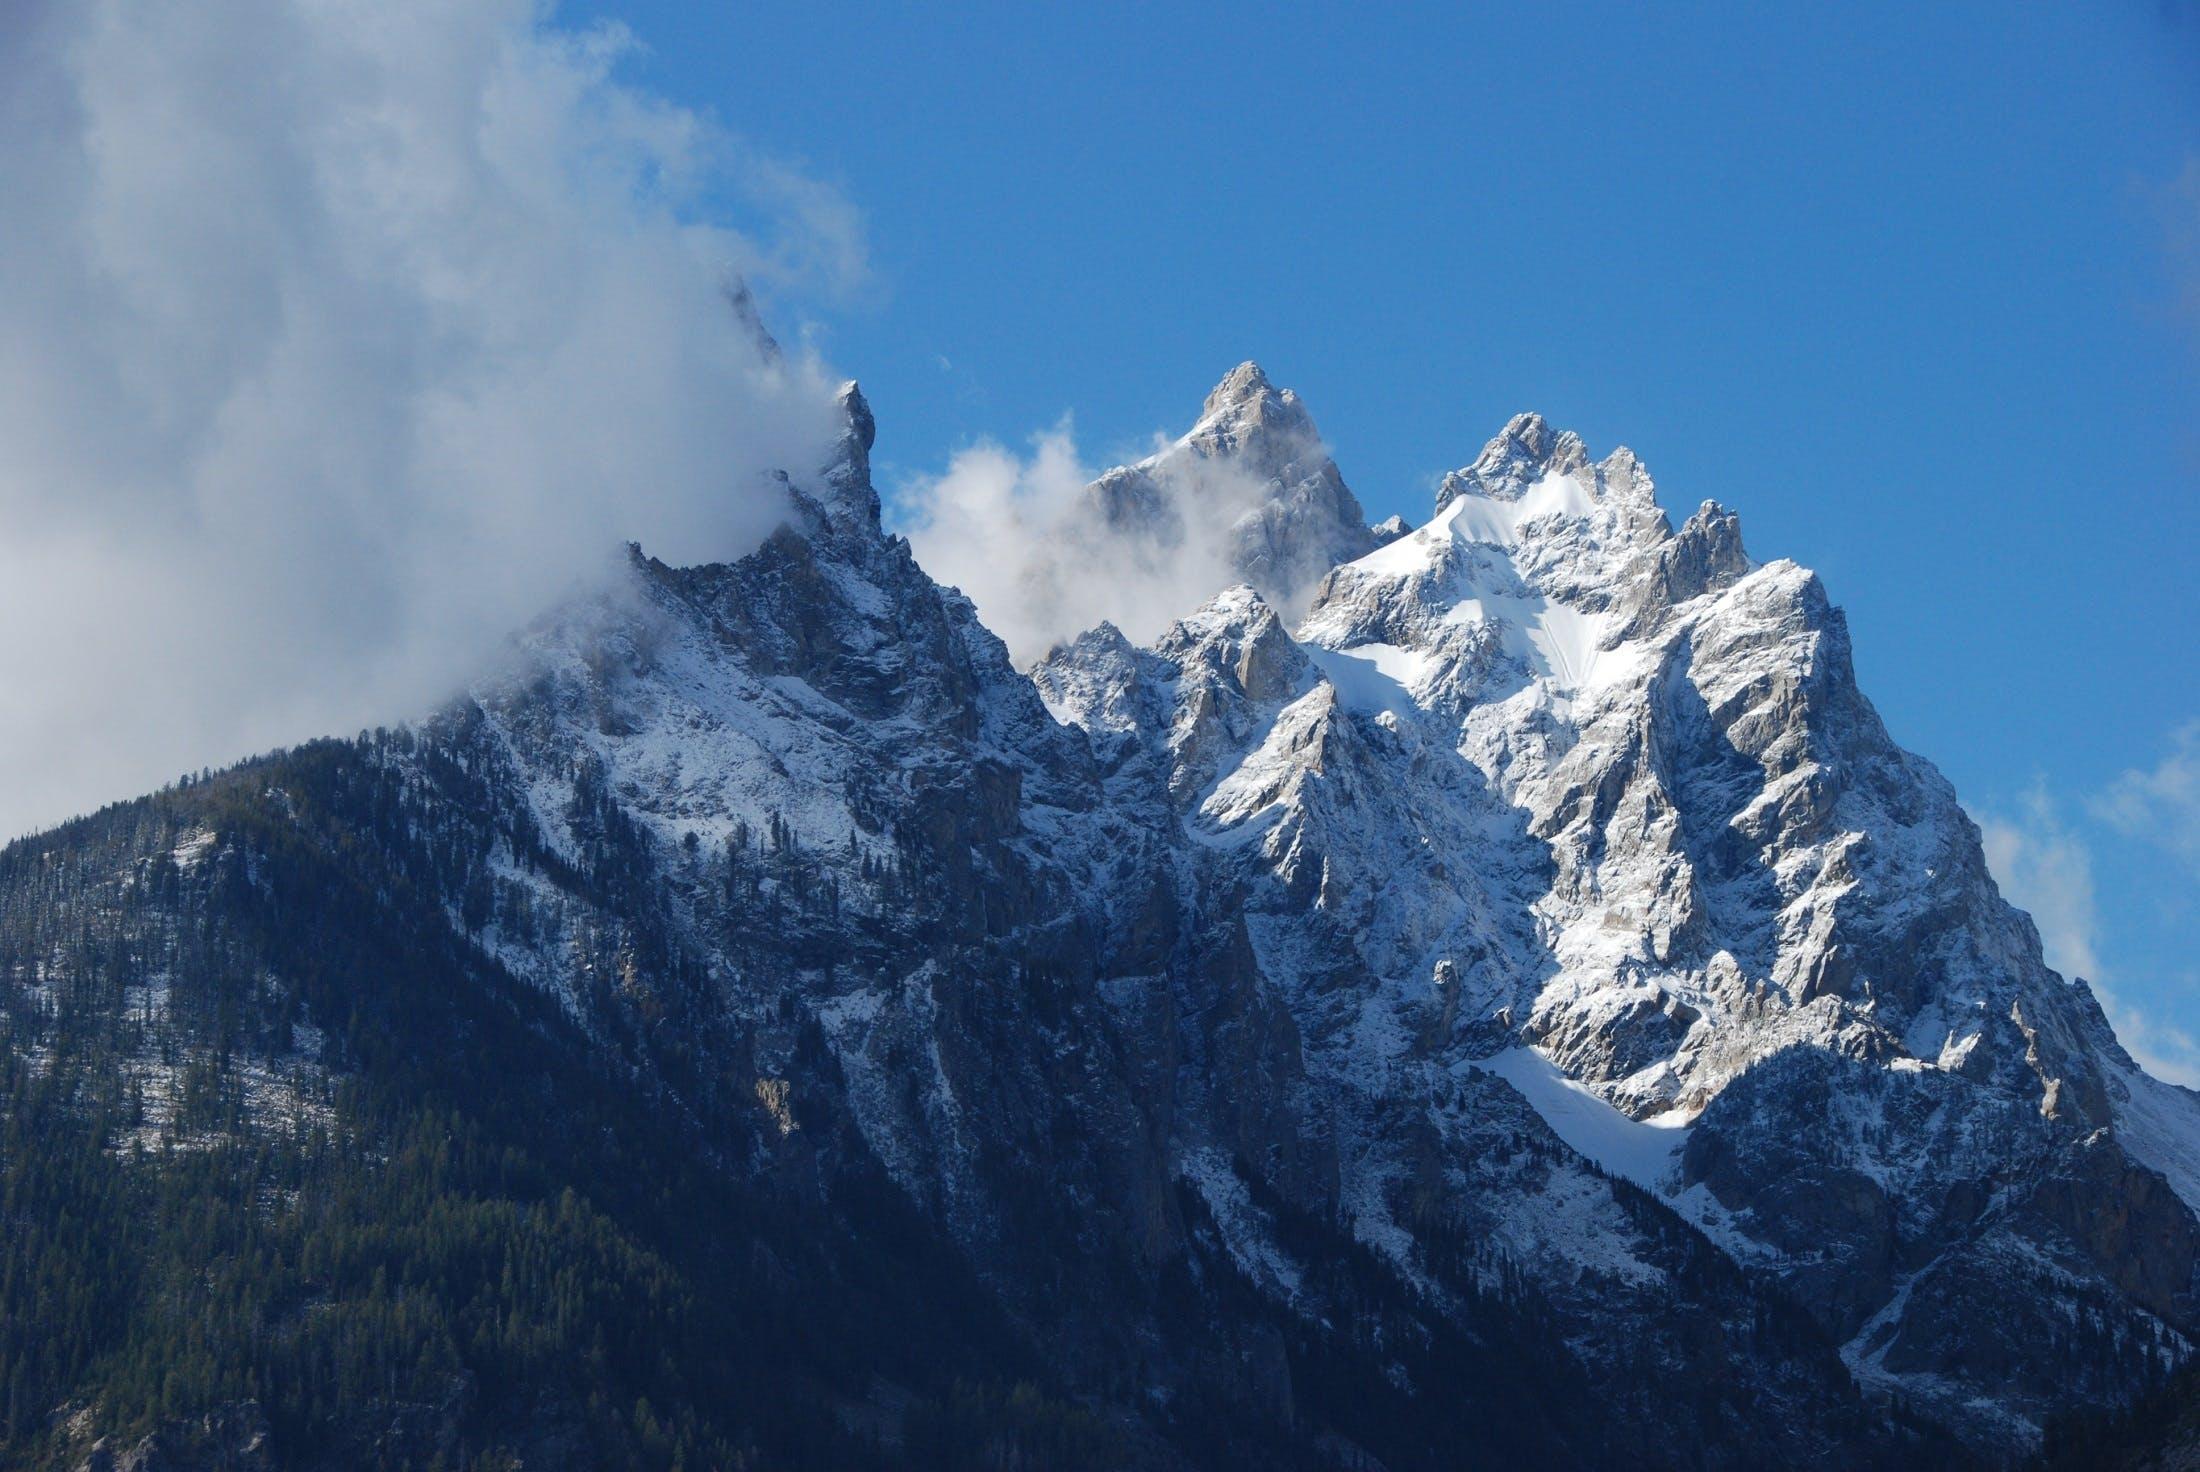 Kostenloses Stock Foto zu berg, felsig, kalt, landschaft